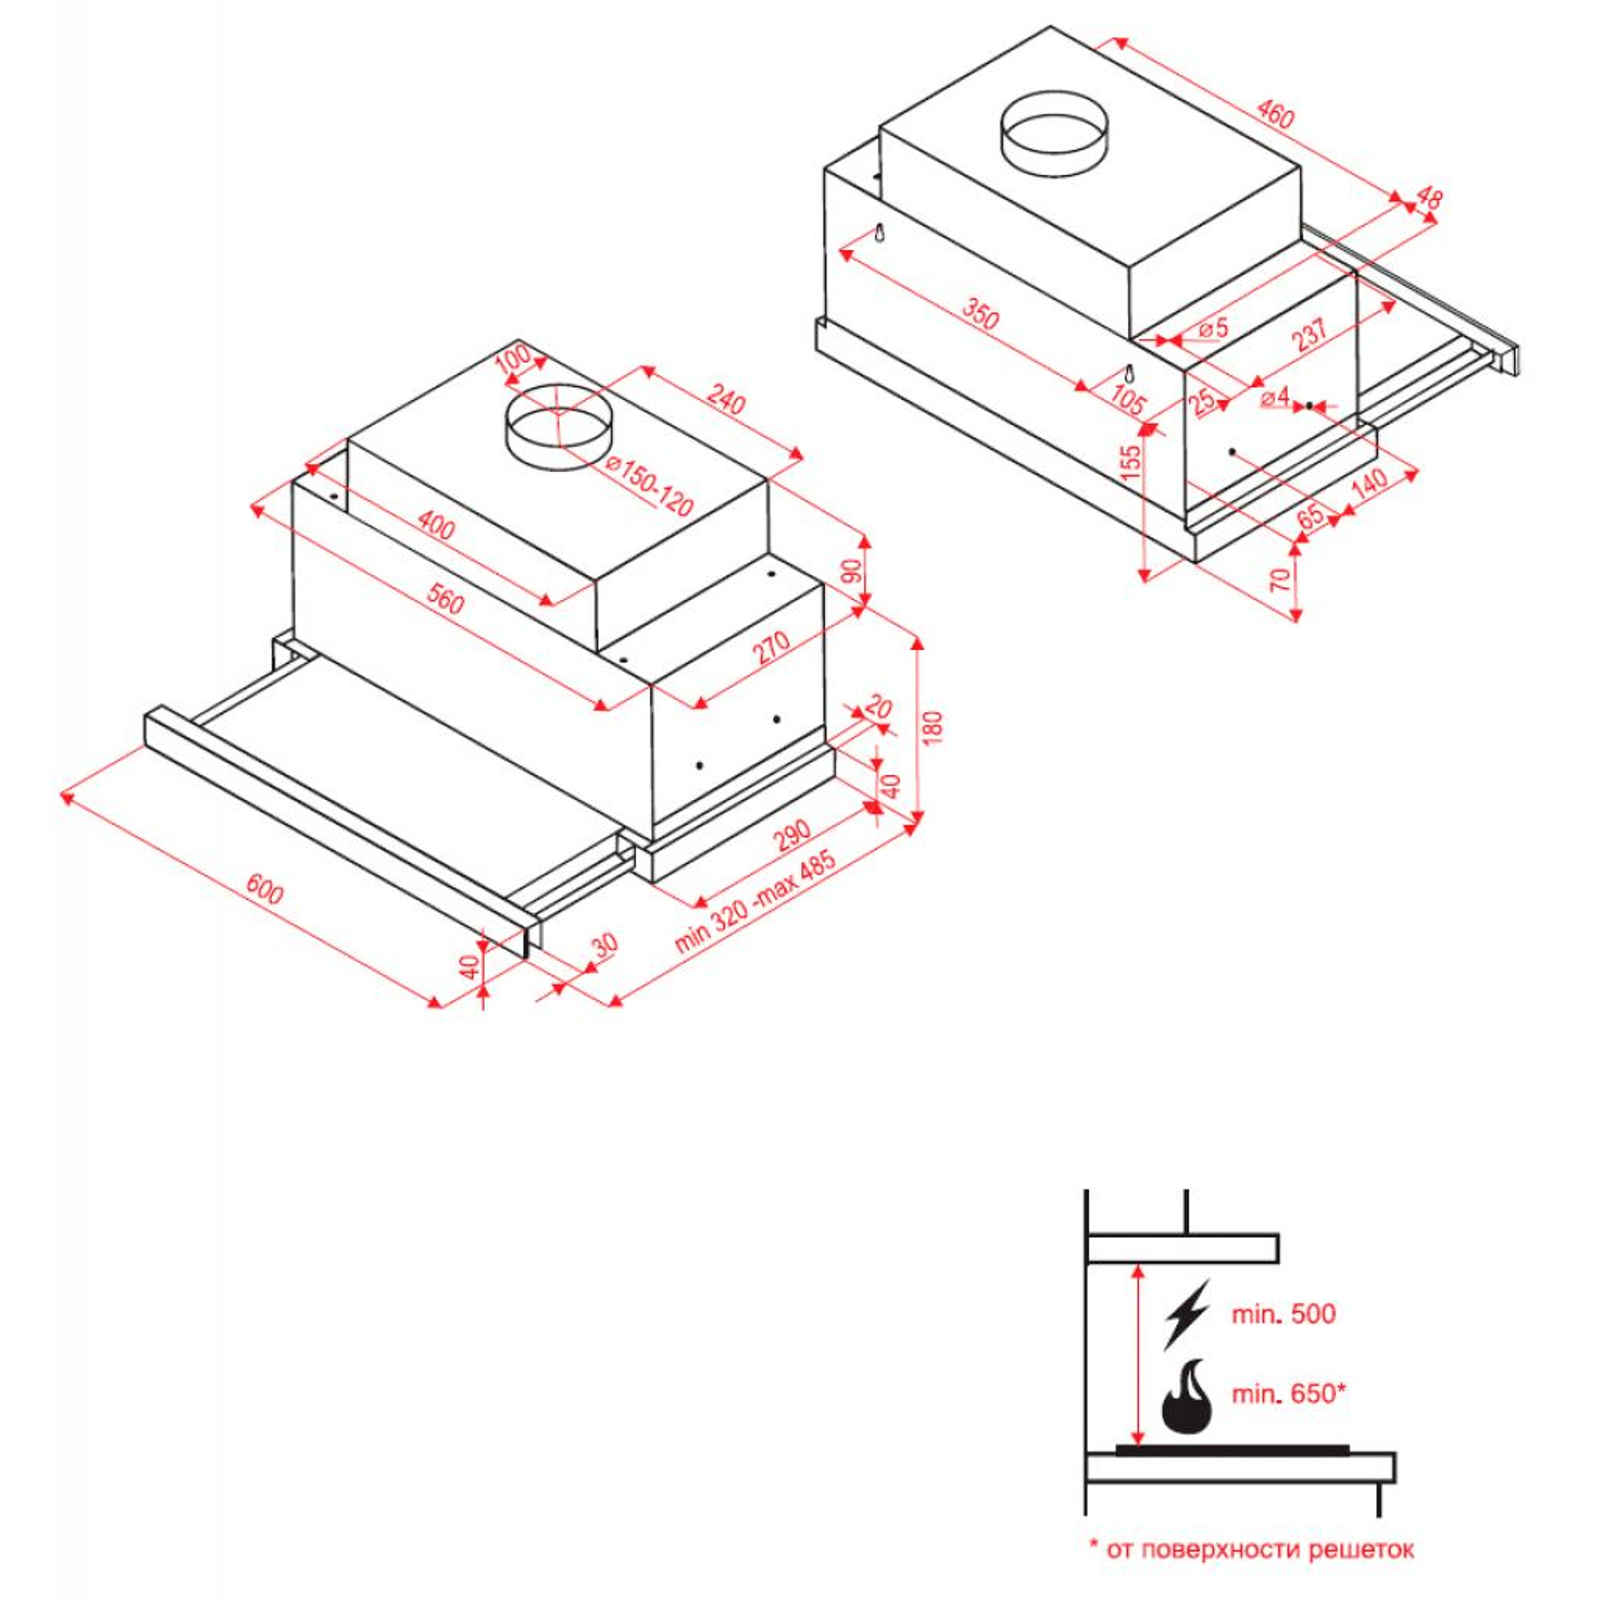 Вытяжка кухонная PERFELLI TLS 6832 W LED изображение 9